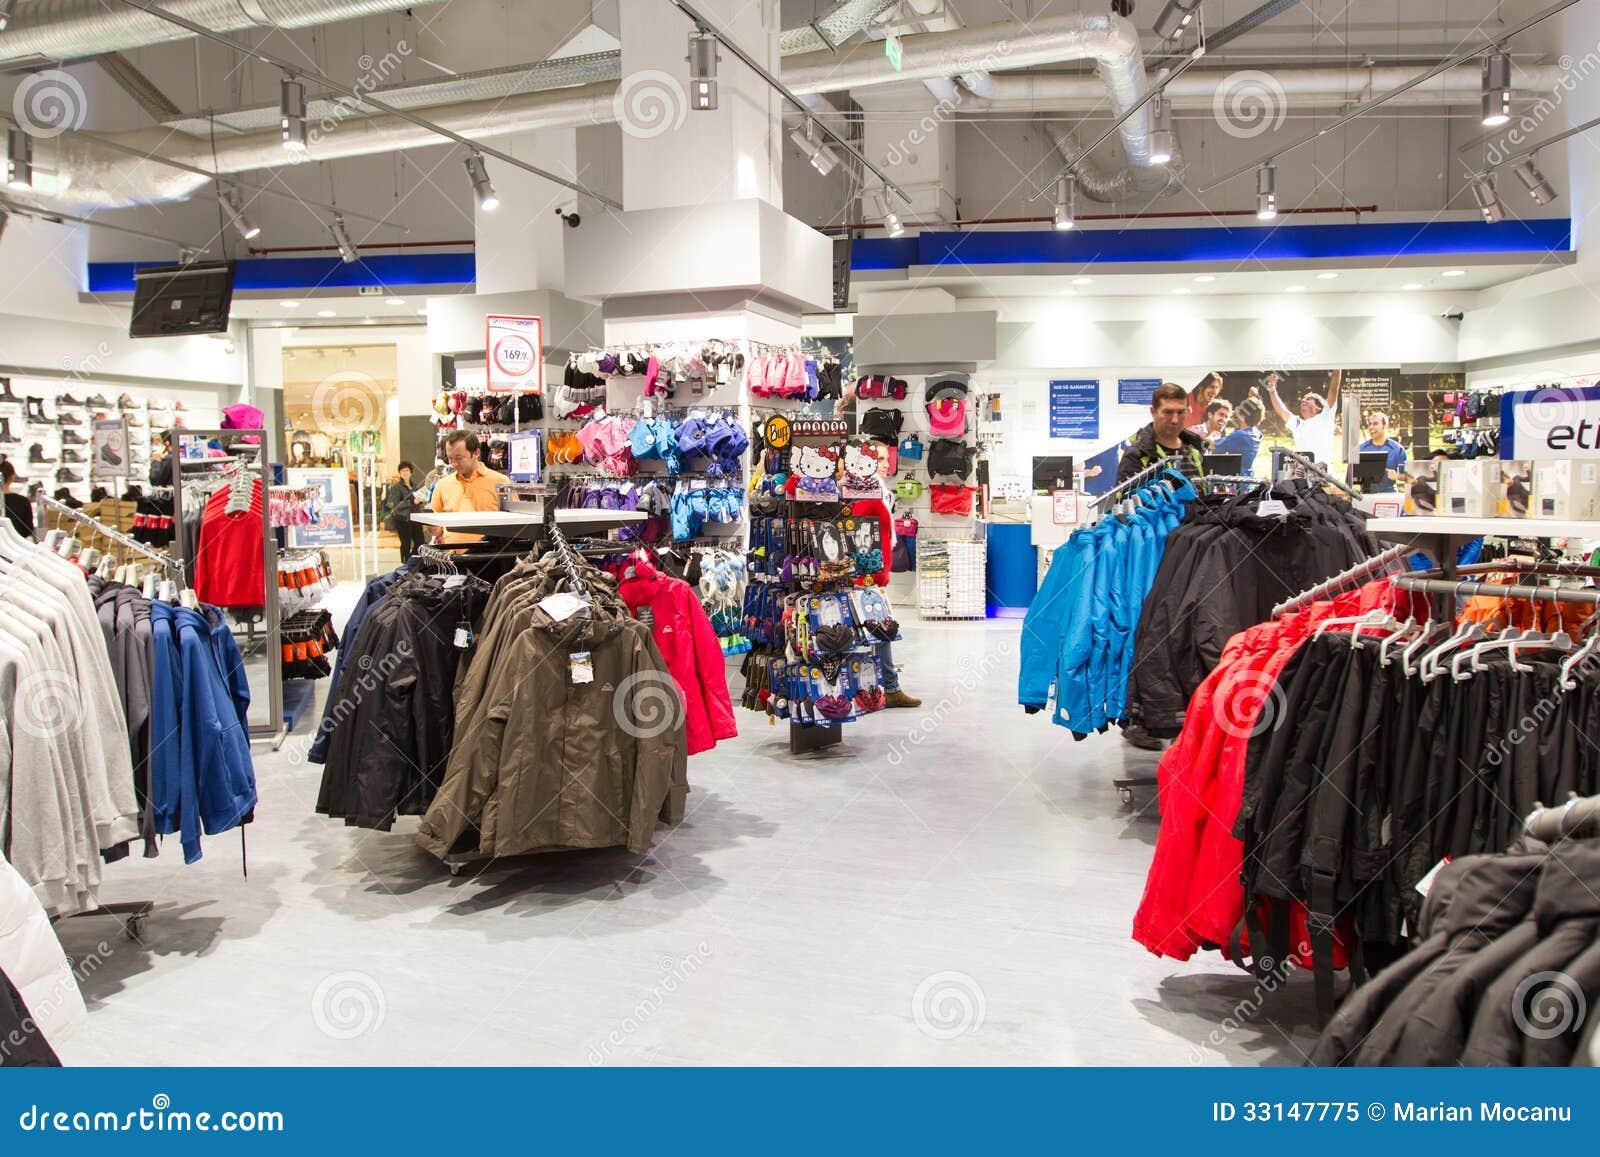 42be4423077364fd_Boys_Clothing_Stores_B.jpg